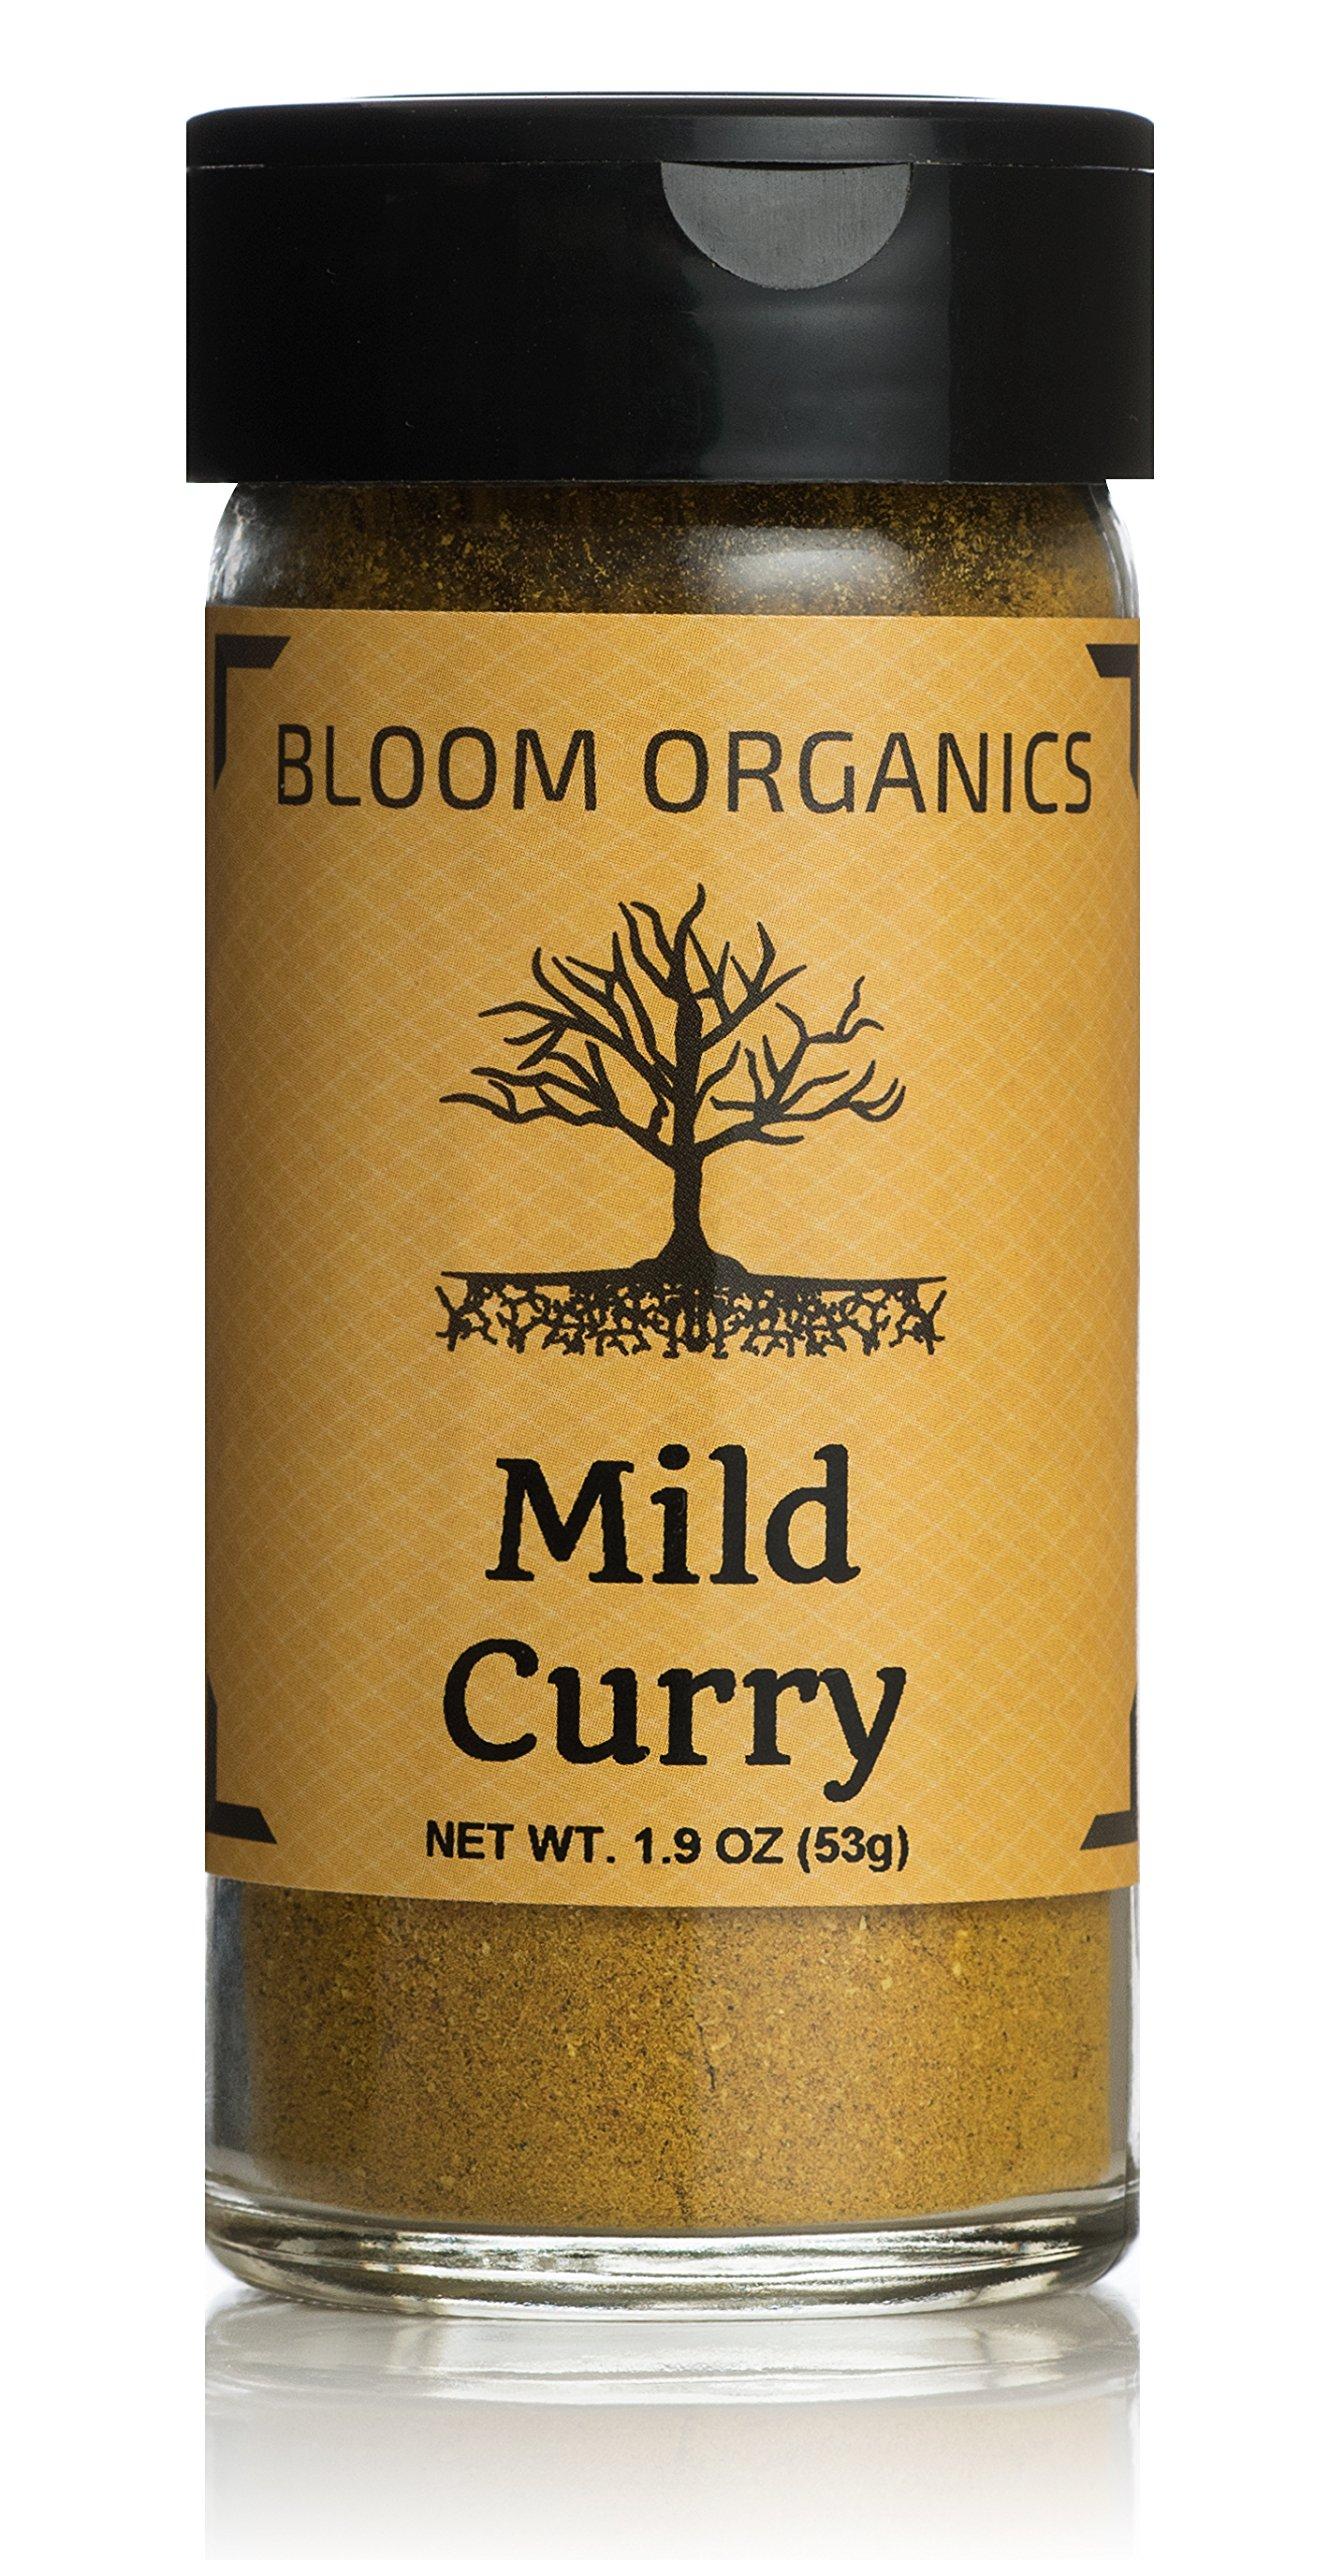 Bloom Organics Mild Curry USDA Certified Organic, 1.9 oz - Glass Jar